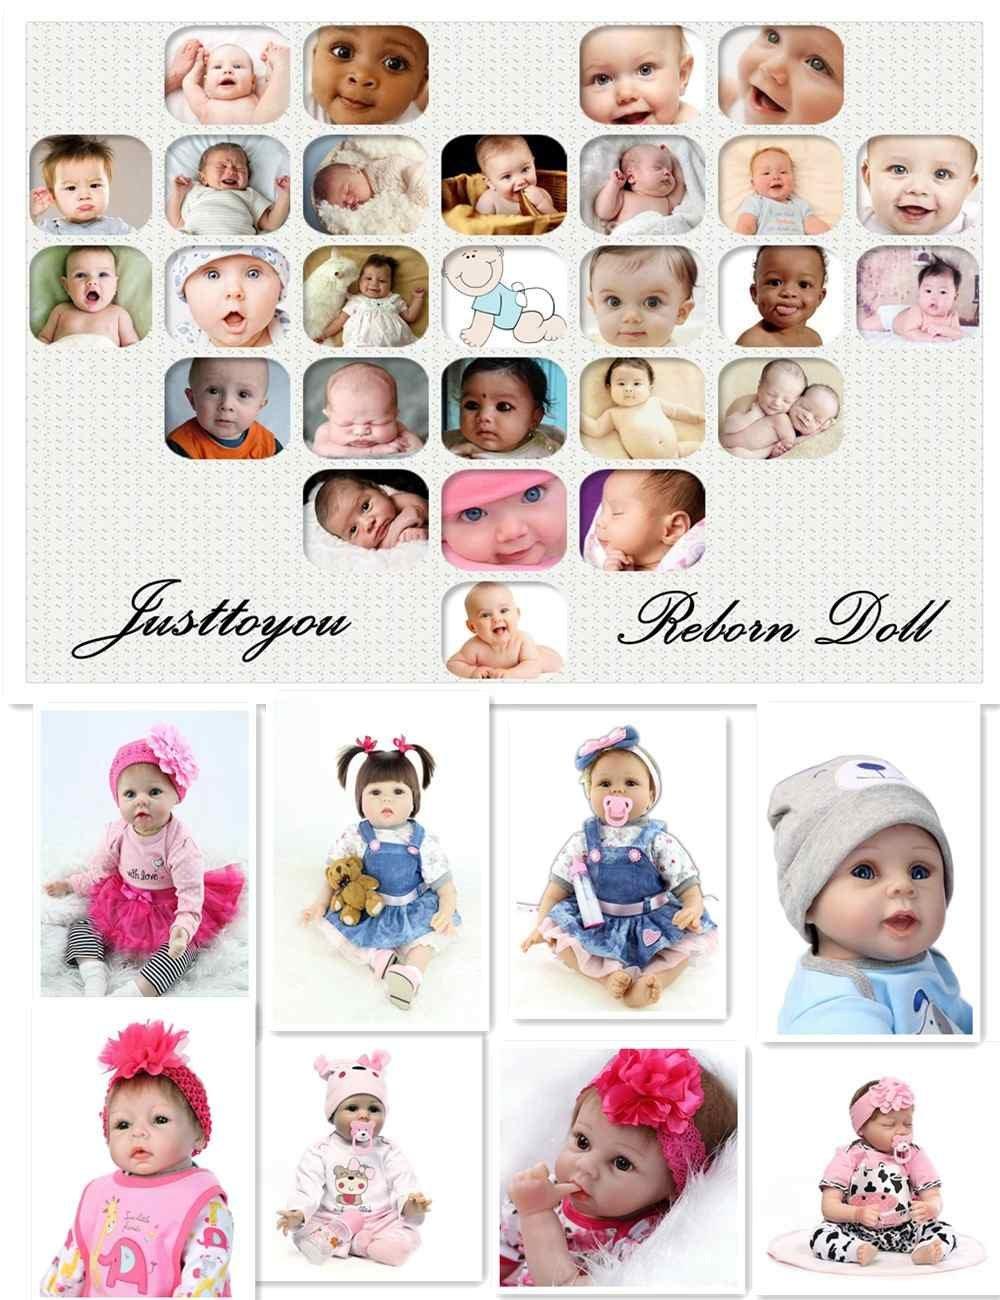 Amazon.com : Justtoyou Soft Silicone Reborn Baby Dolls Reborn Dolls ...